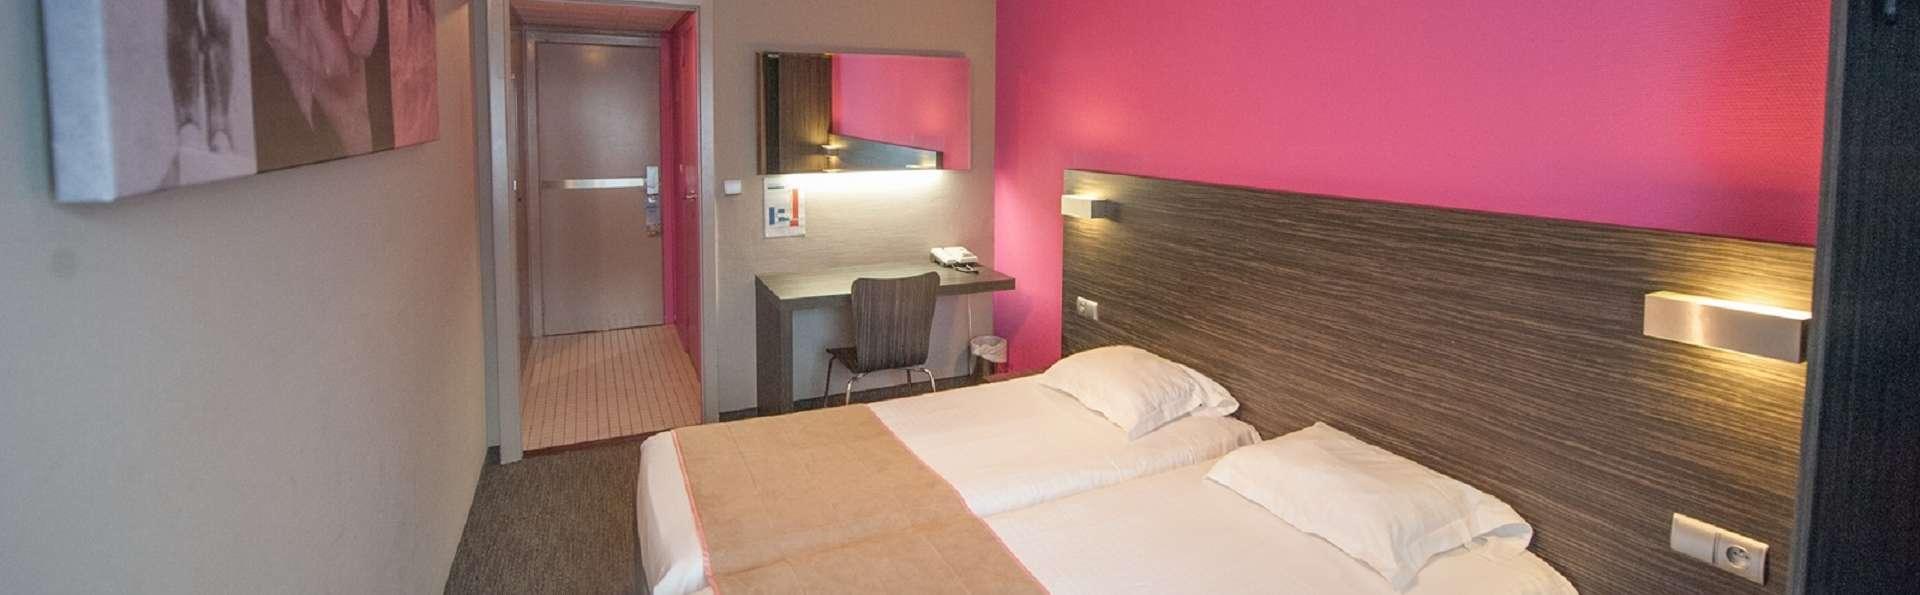 Ostend Hotel - 201748124037177-twin-rose-3.jpg-big.jpg